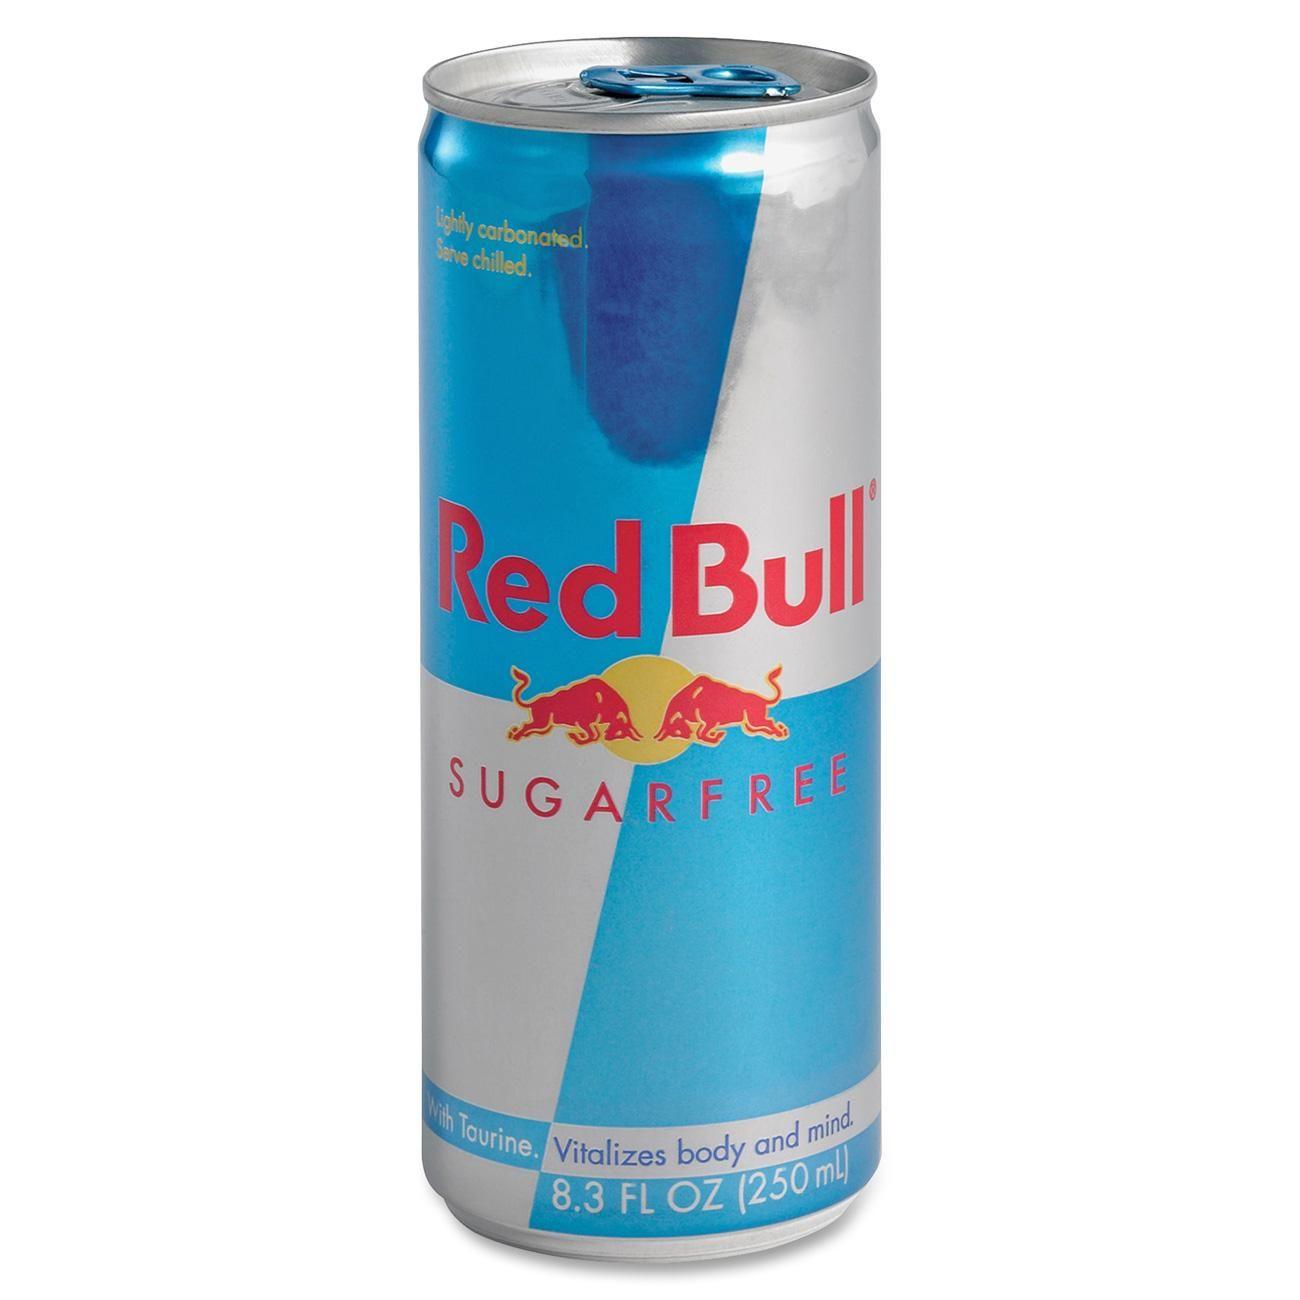 Red Bull Energy Drink, 8.3oz. Can, 24/CT, Sugar-Free RBD1...